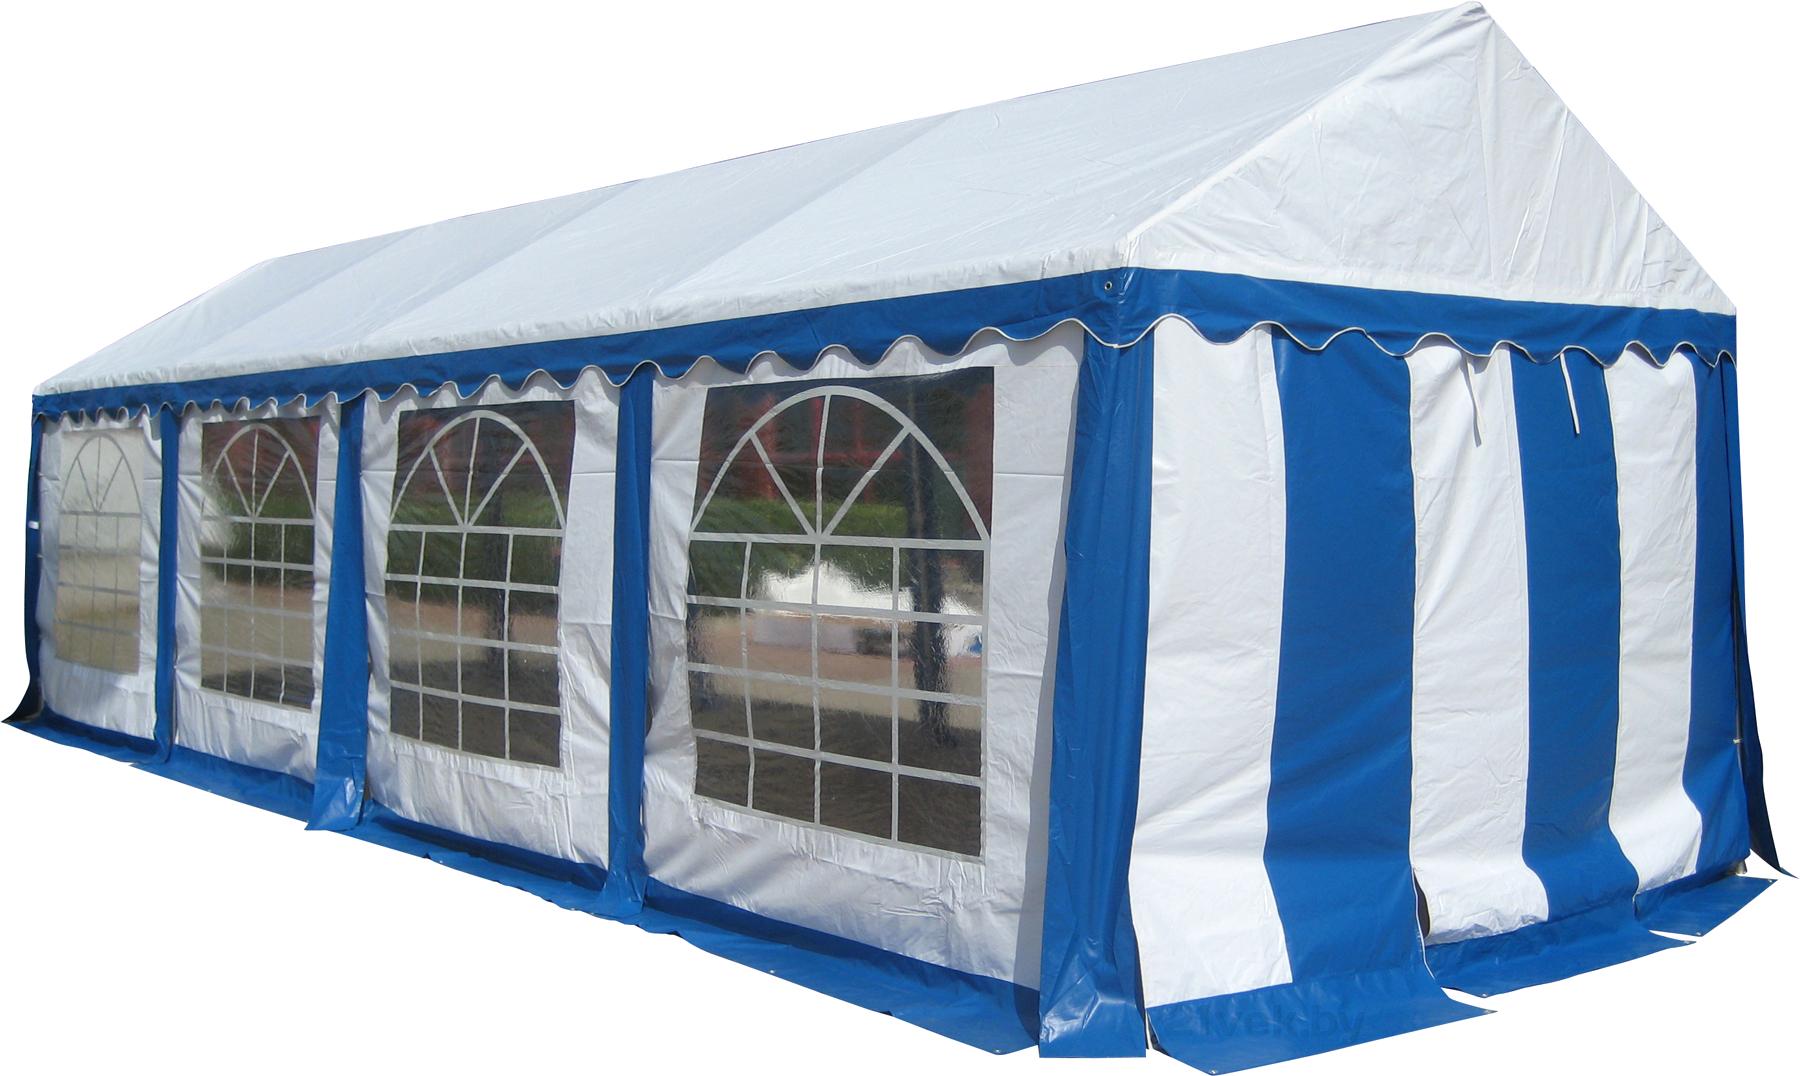 Купить Тент-шатер Sundays, 38201, Китай